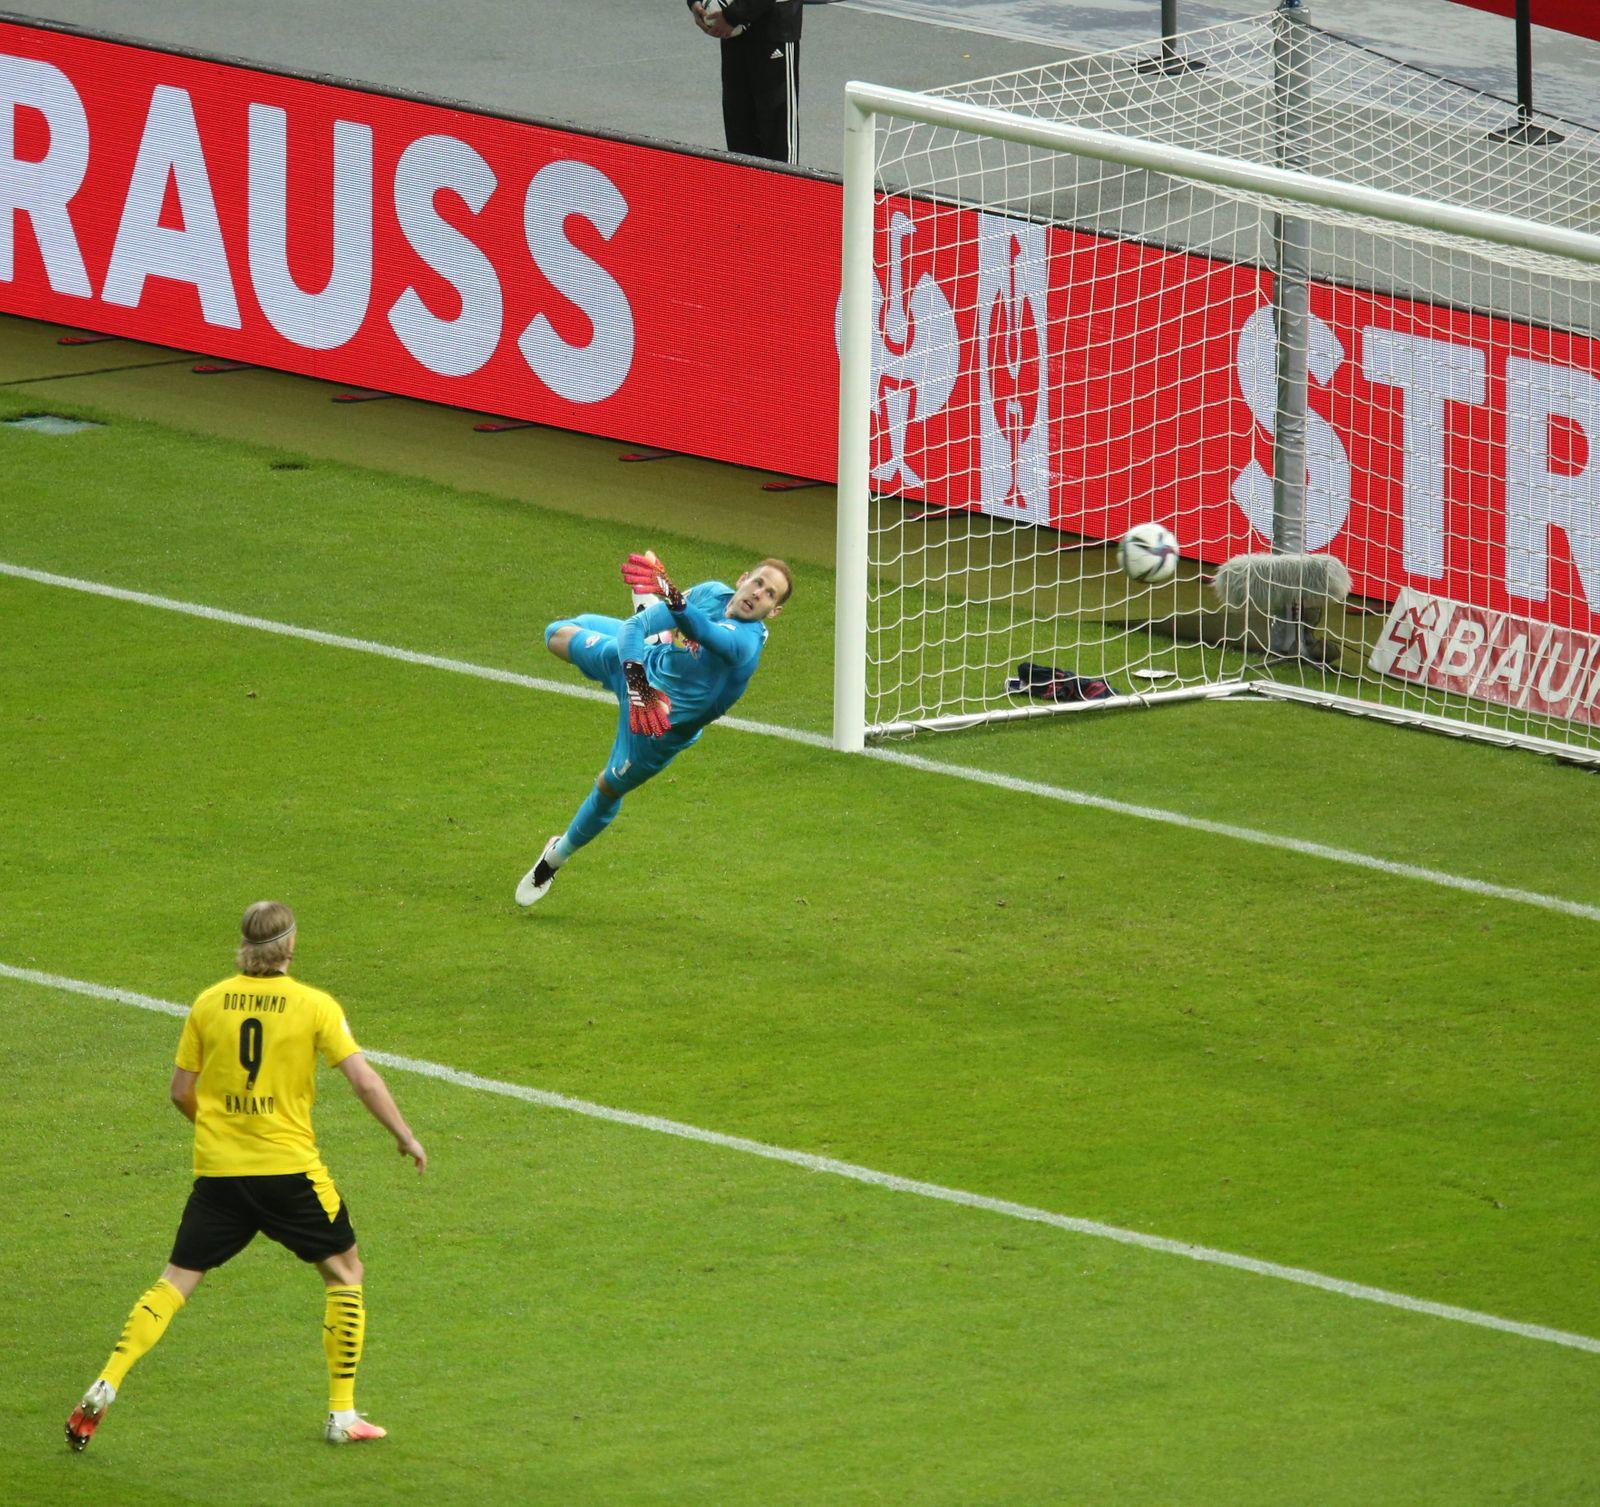 13.05.2021, Fussball DFB Pokal 2020/2021, Finale , RB Leipzig - Borussia Dortmund, im Olympiastadion Berlin. Torwart Pet